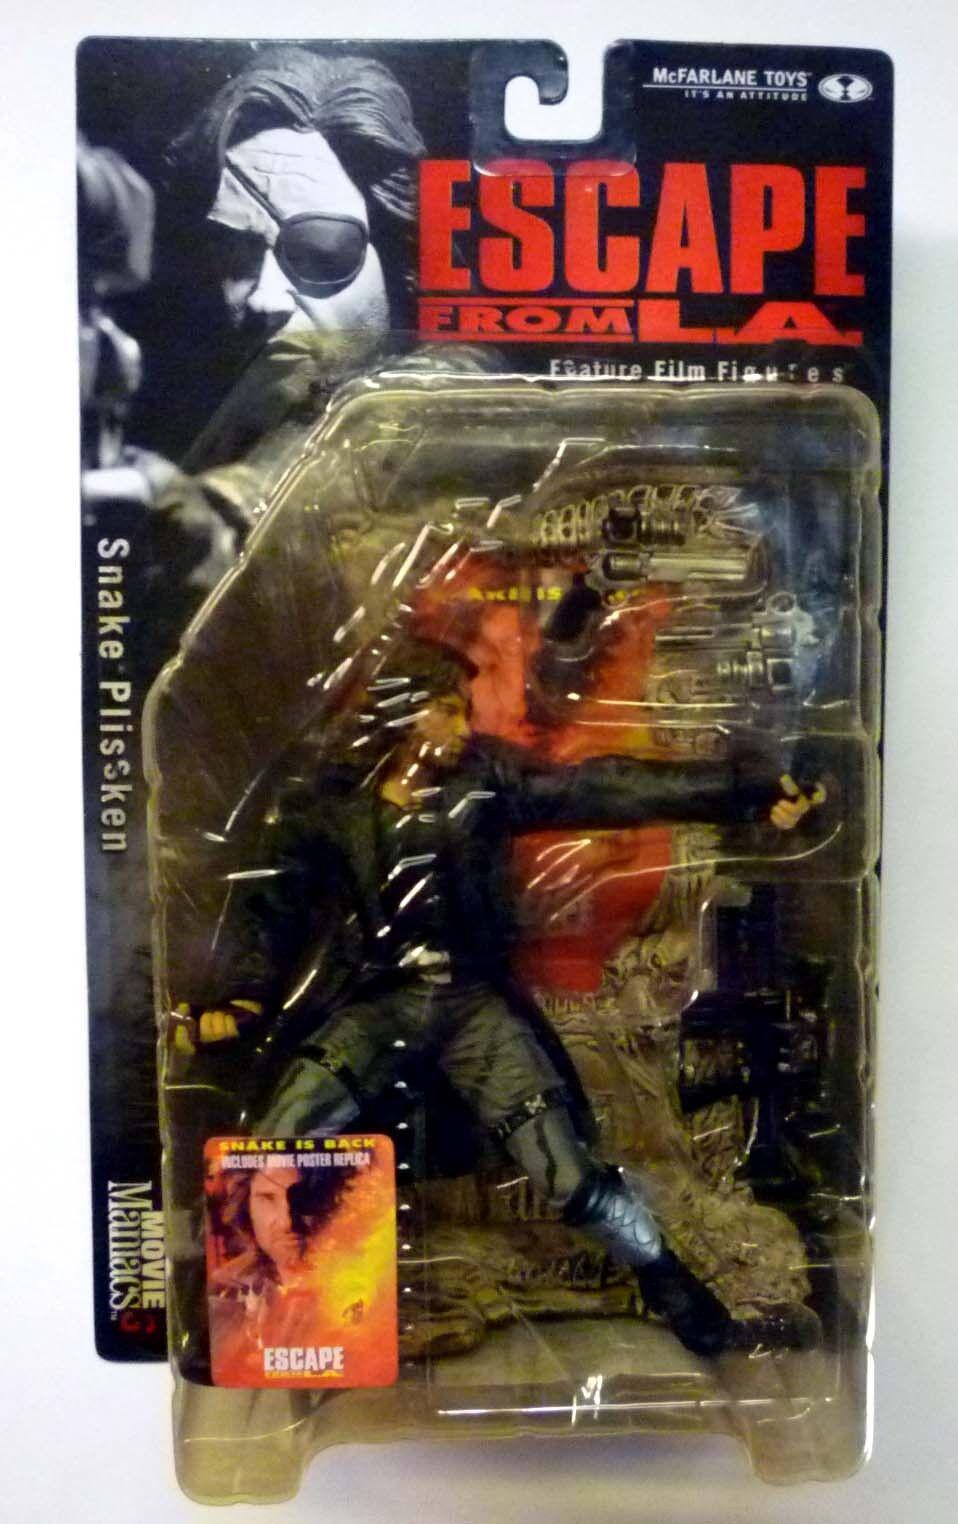 McFarlane giocattoli Movie uomoiacs Series  3 Snake Plissken  AF Kurt Russell nuovo 2000  si affrettò a vedere